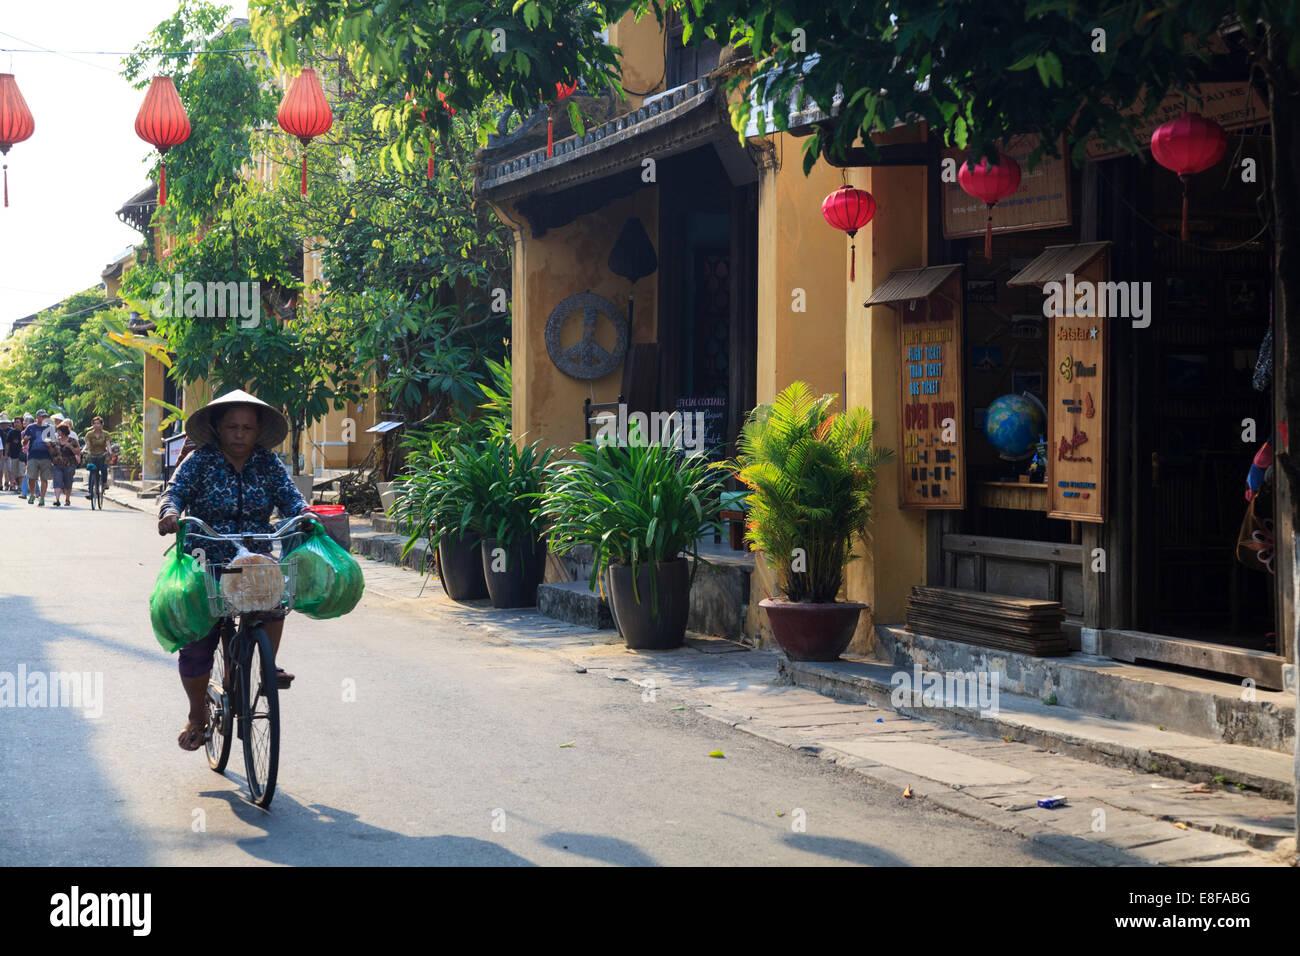 Vietnam, Quang Nam, Hoi An old town (UNESCO Site) - Stock Image